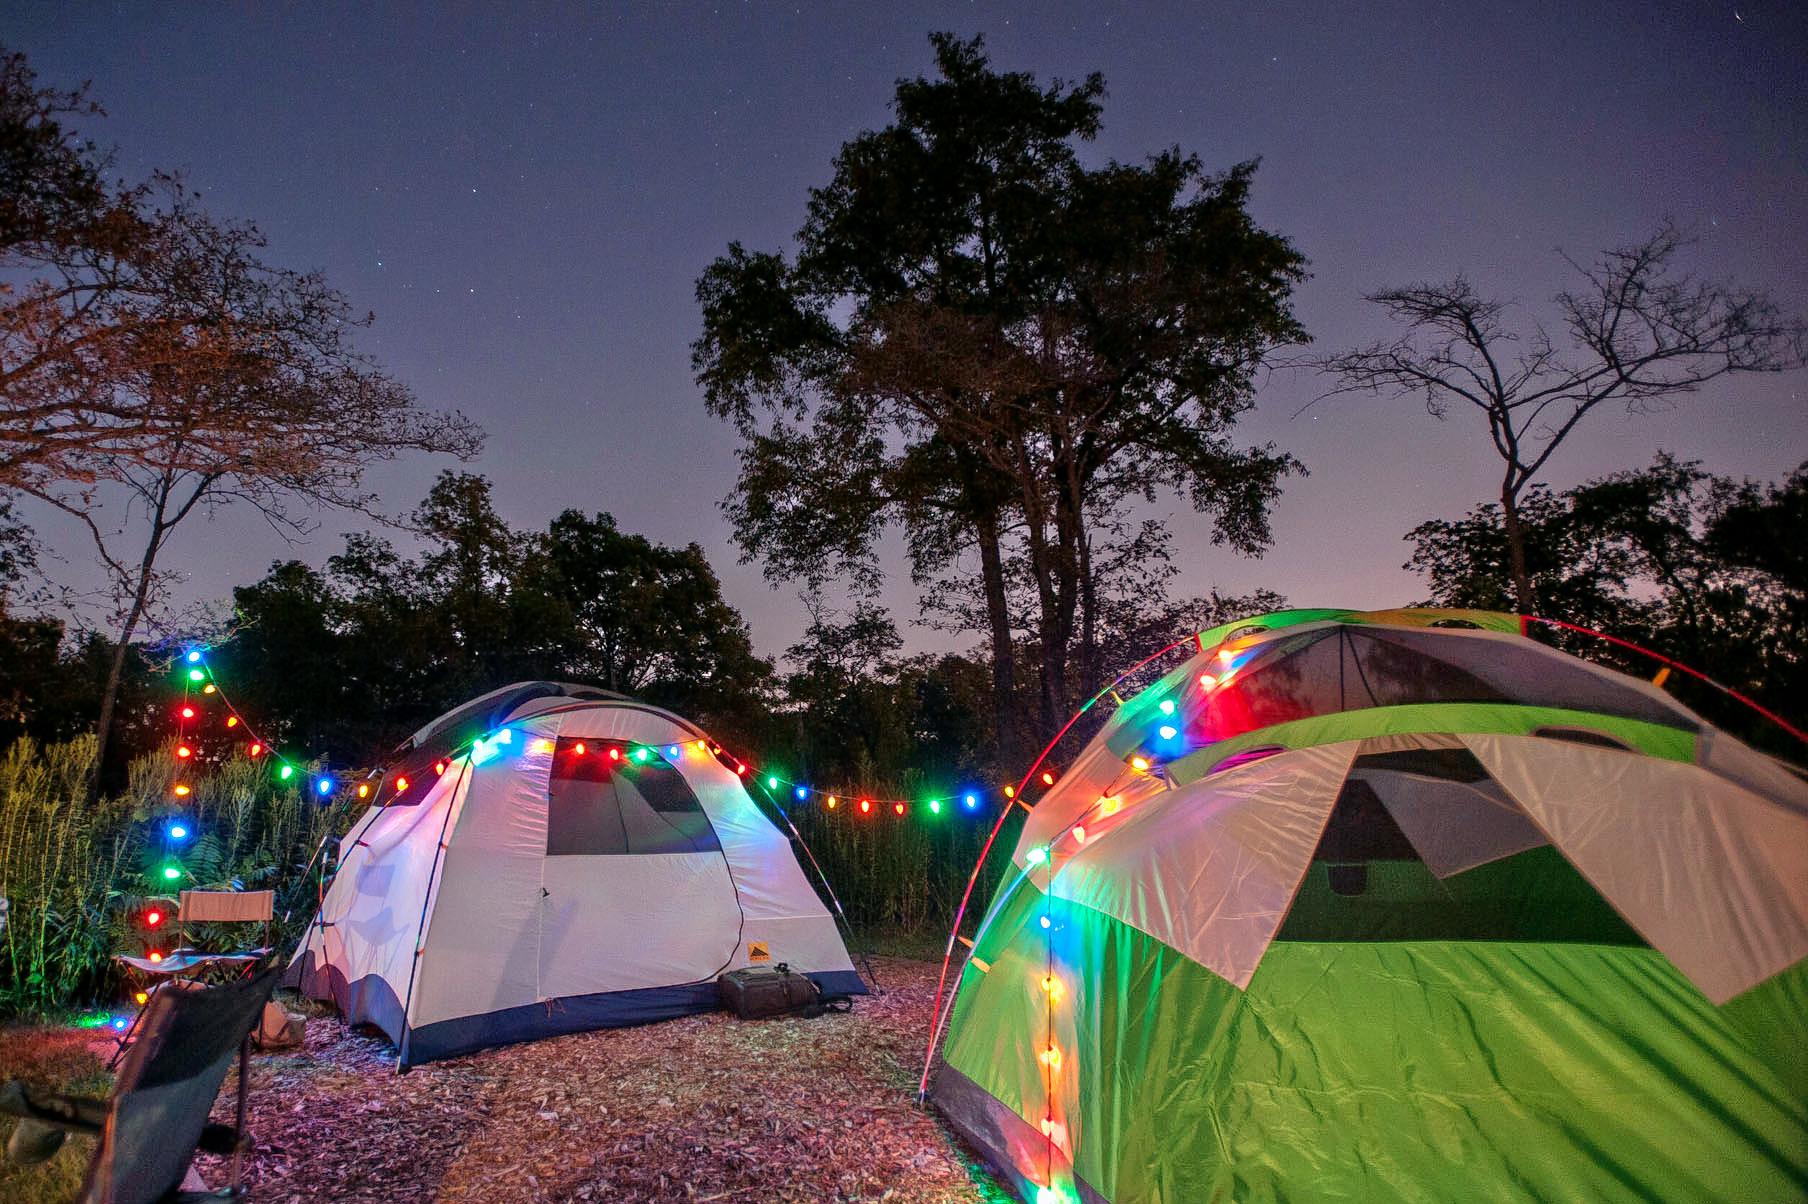 1513843921_camping-tents.jpg